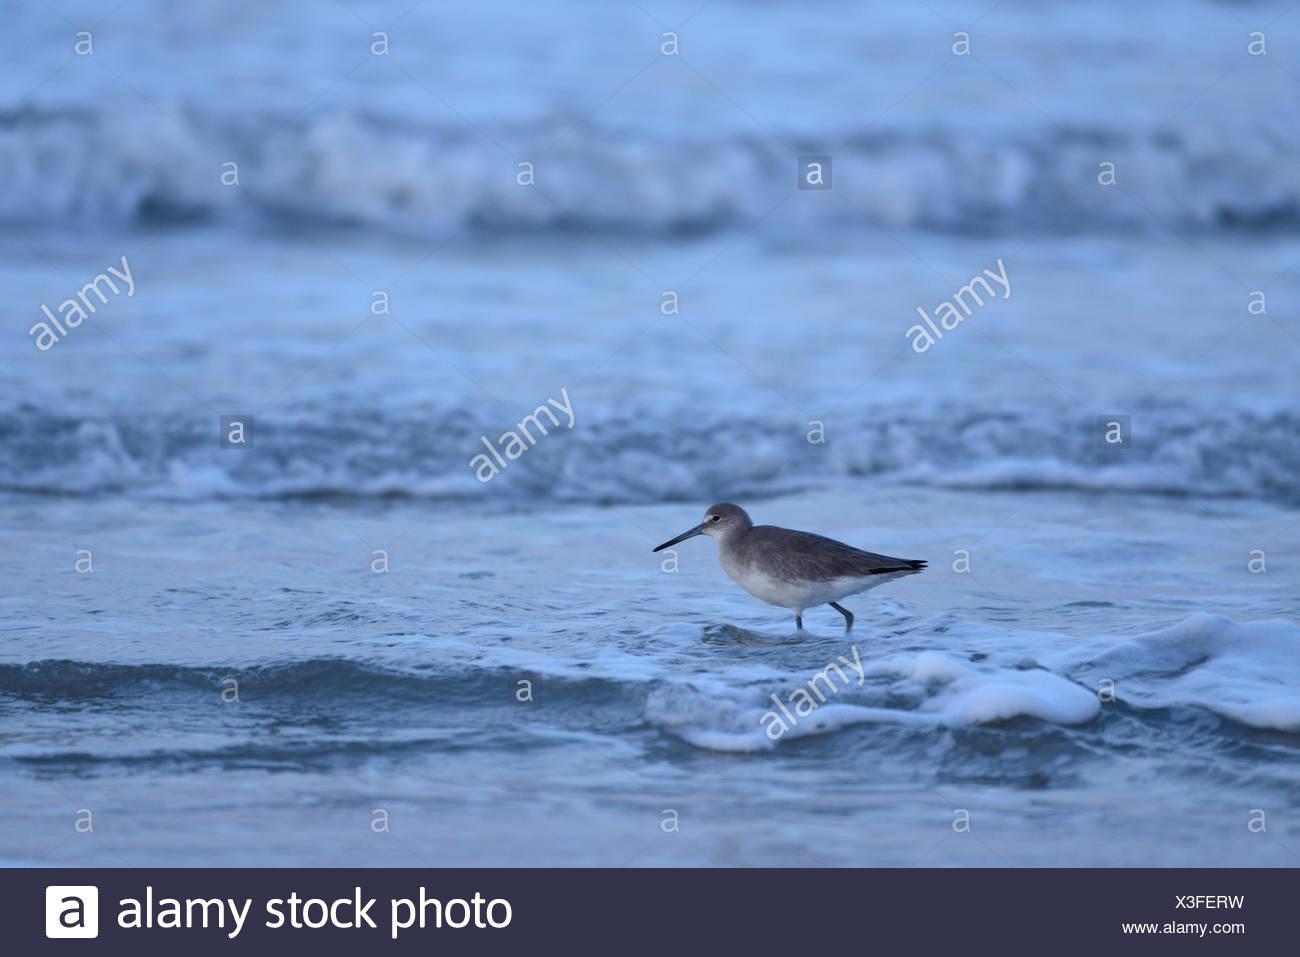 USA, United States, America, Texas, Corpus Christi, Padre Island, bird, surf, ocean Stock Photo